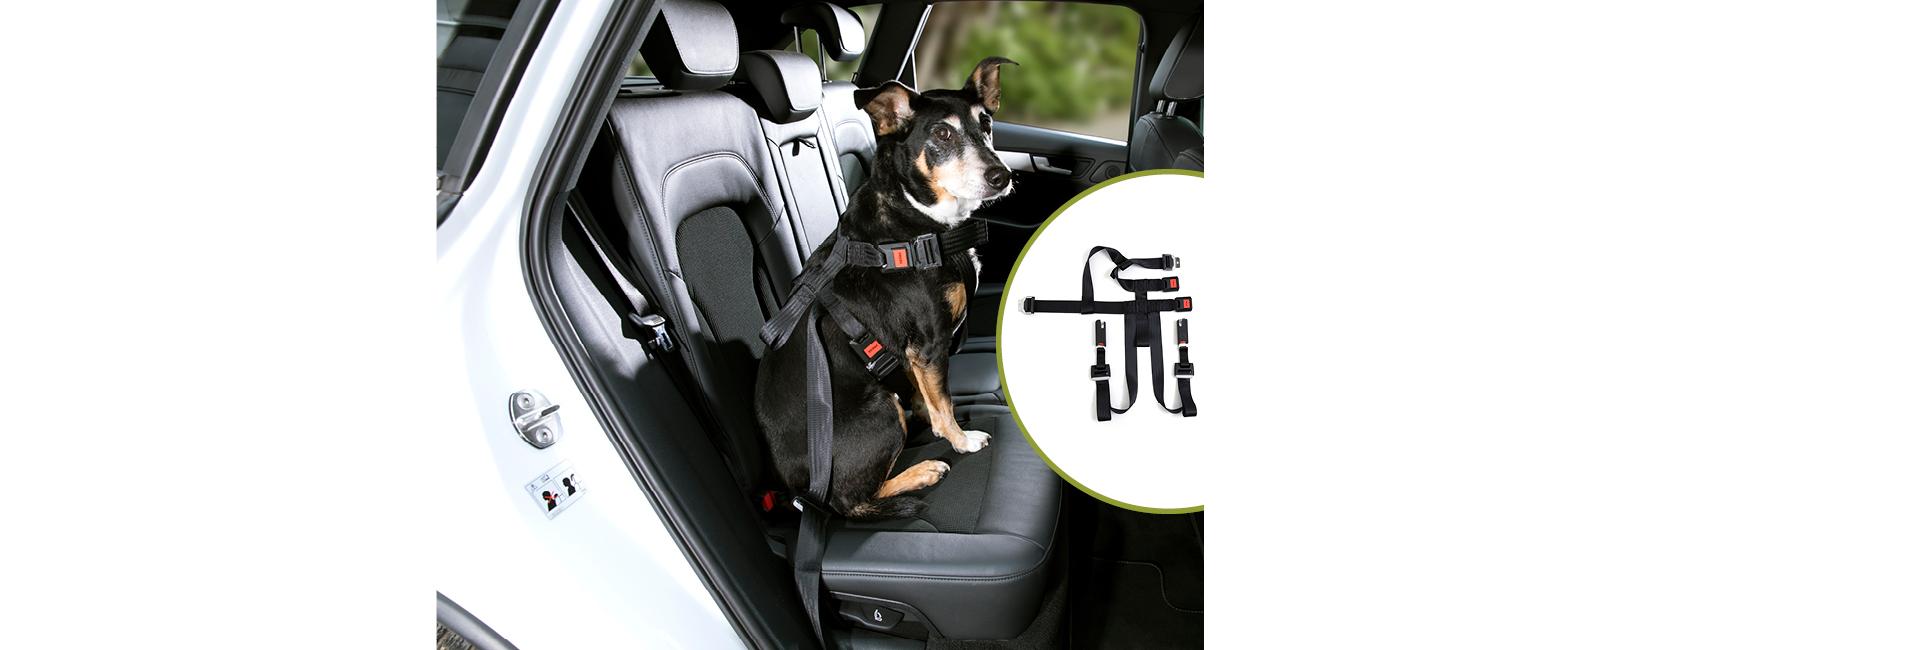 DoggySafe - Hunde Sicherheitsgurt Set für Rückbank